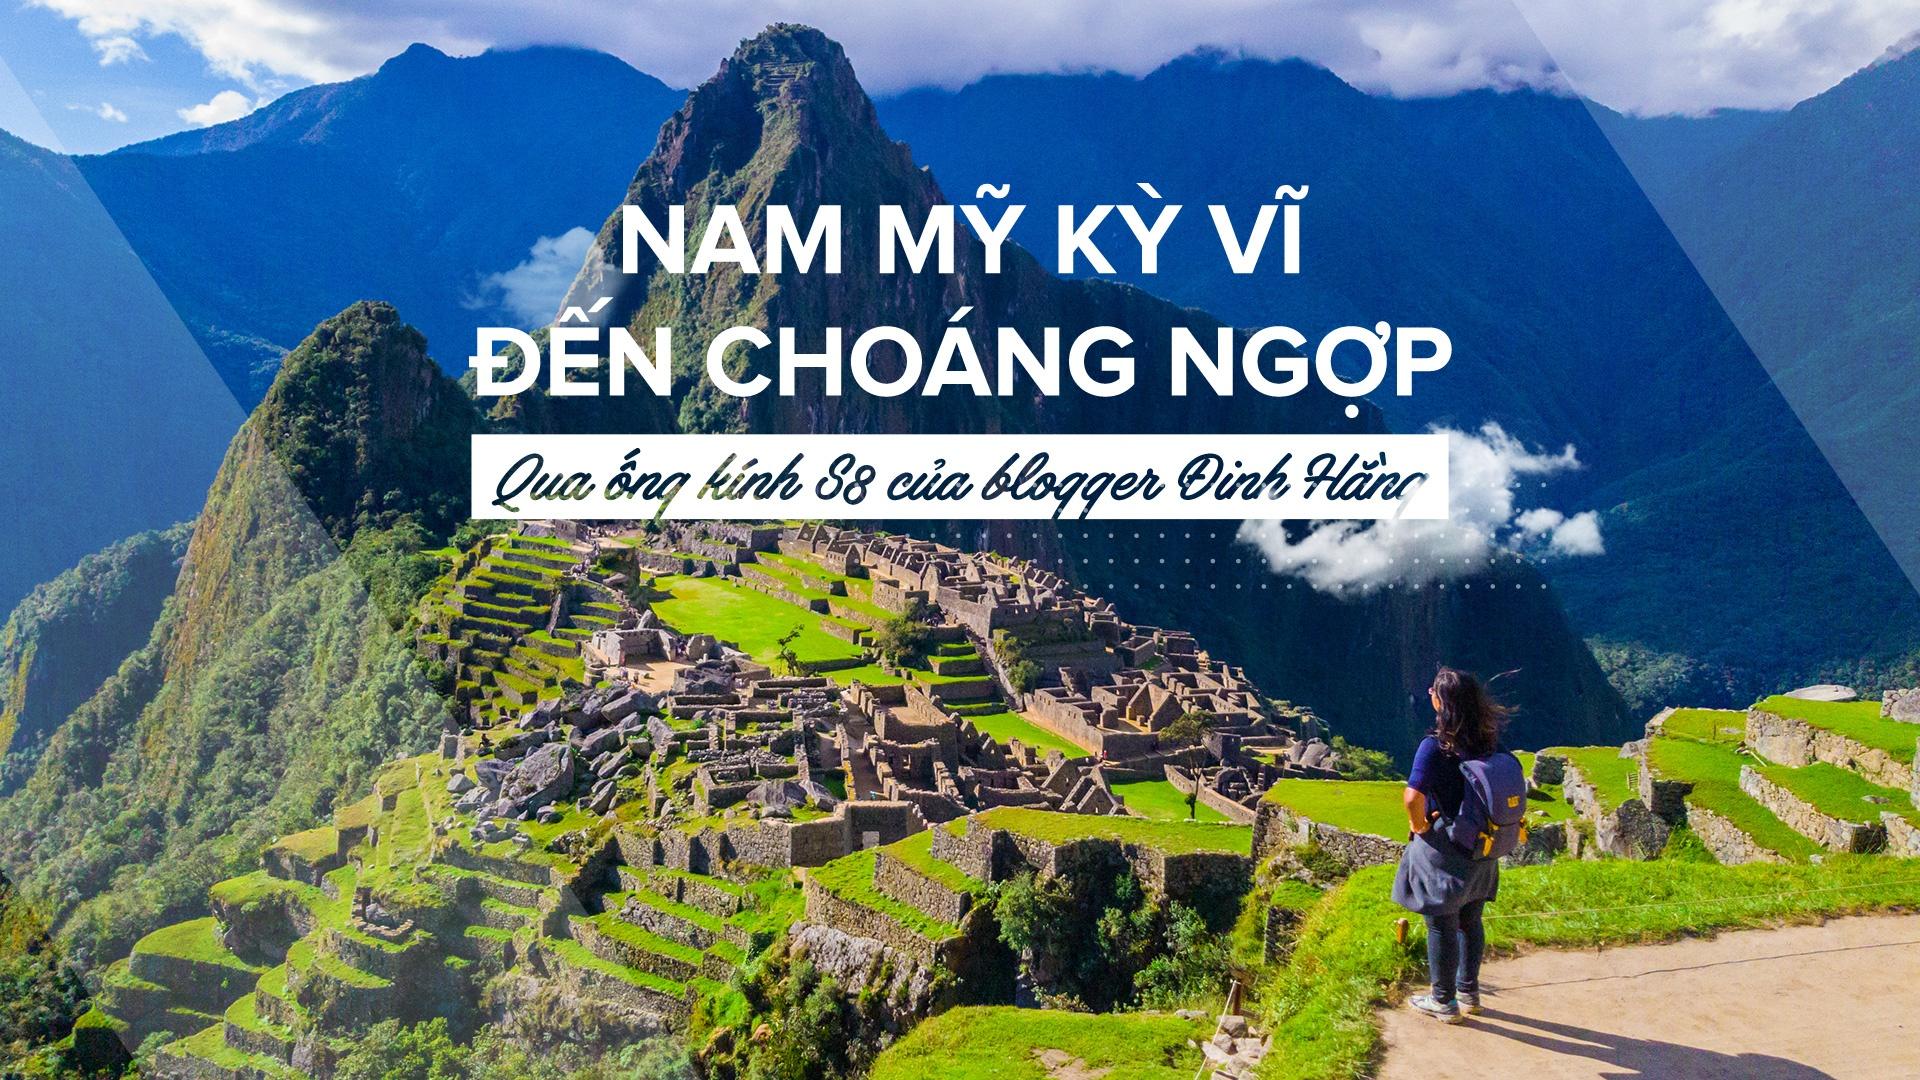 Nam My ky vi qua ong kinh blogger Dinh Hang anh 1